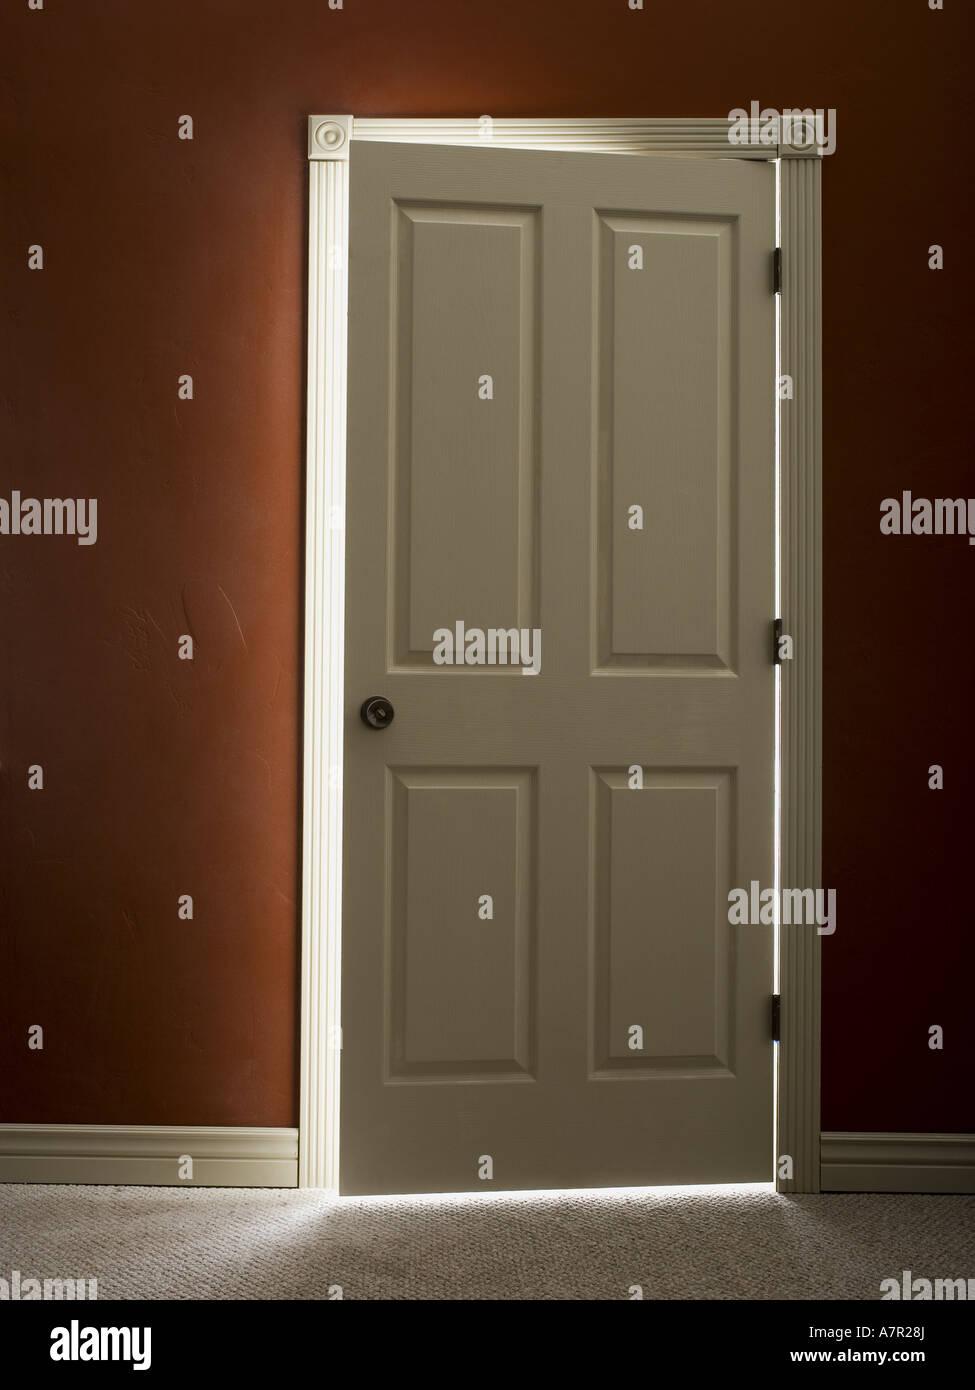 Door slightly ajar with light & Door slightly ajar with light Stock Photo Royalty Free Image ...